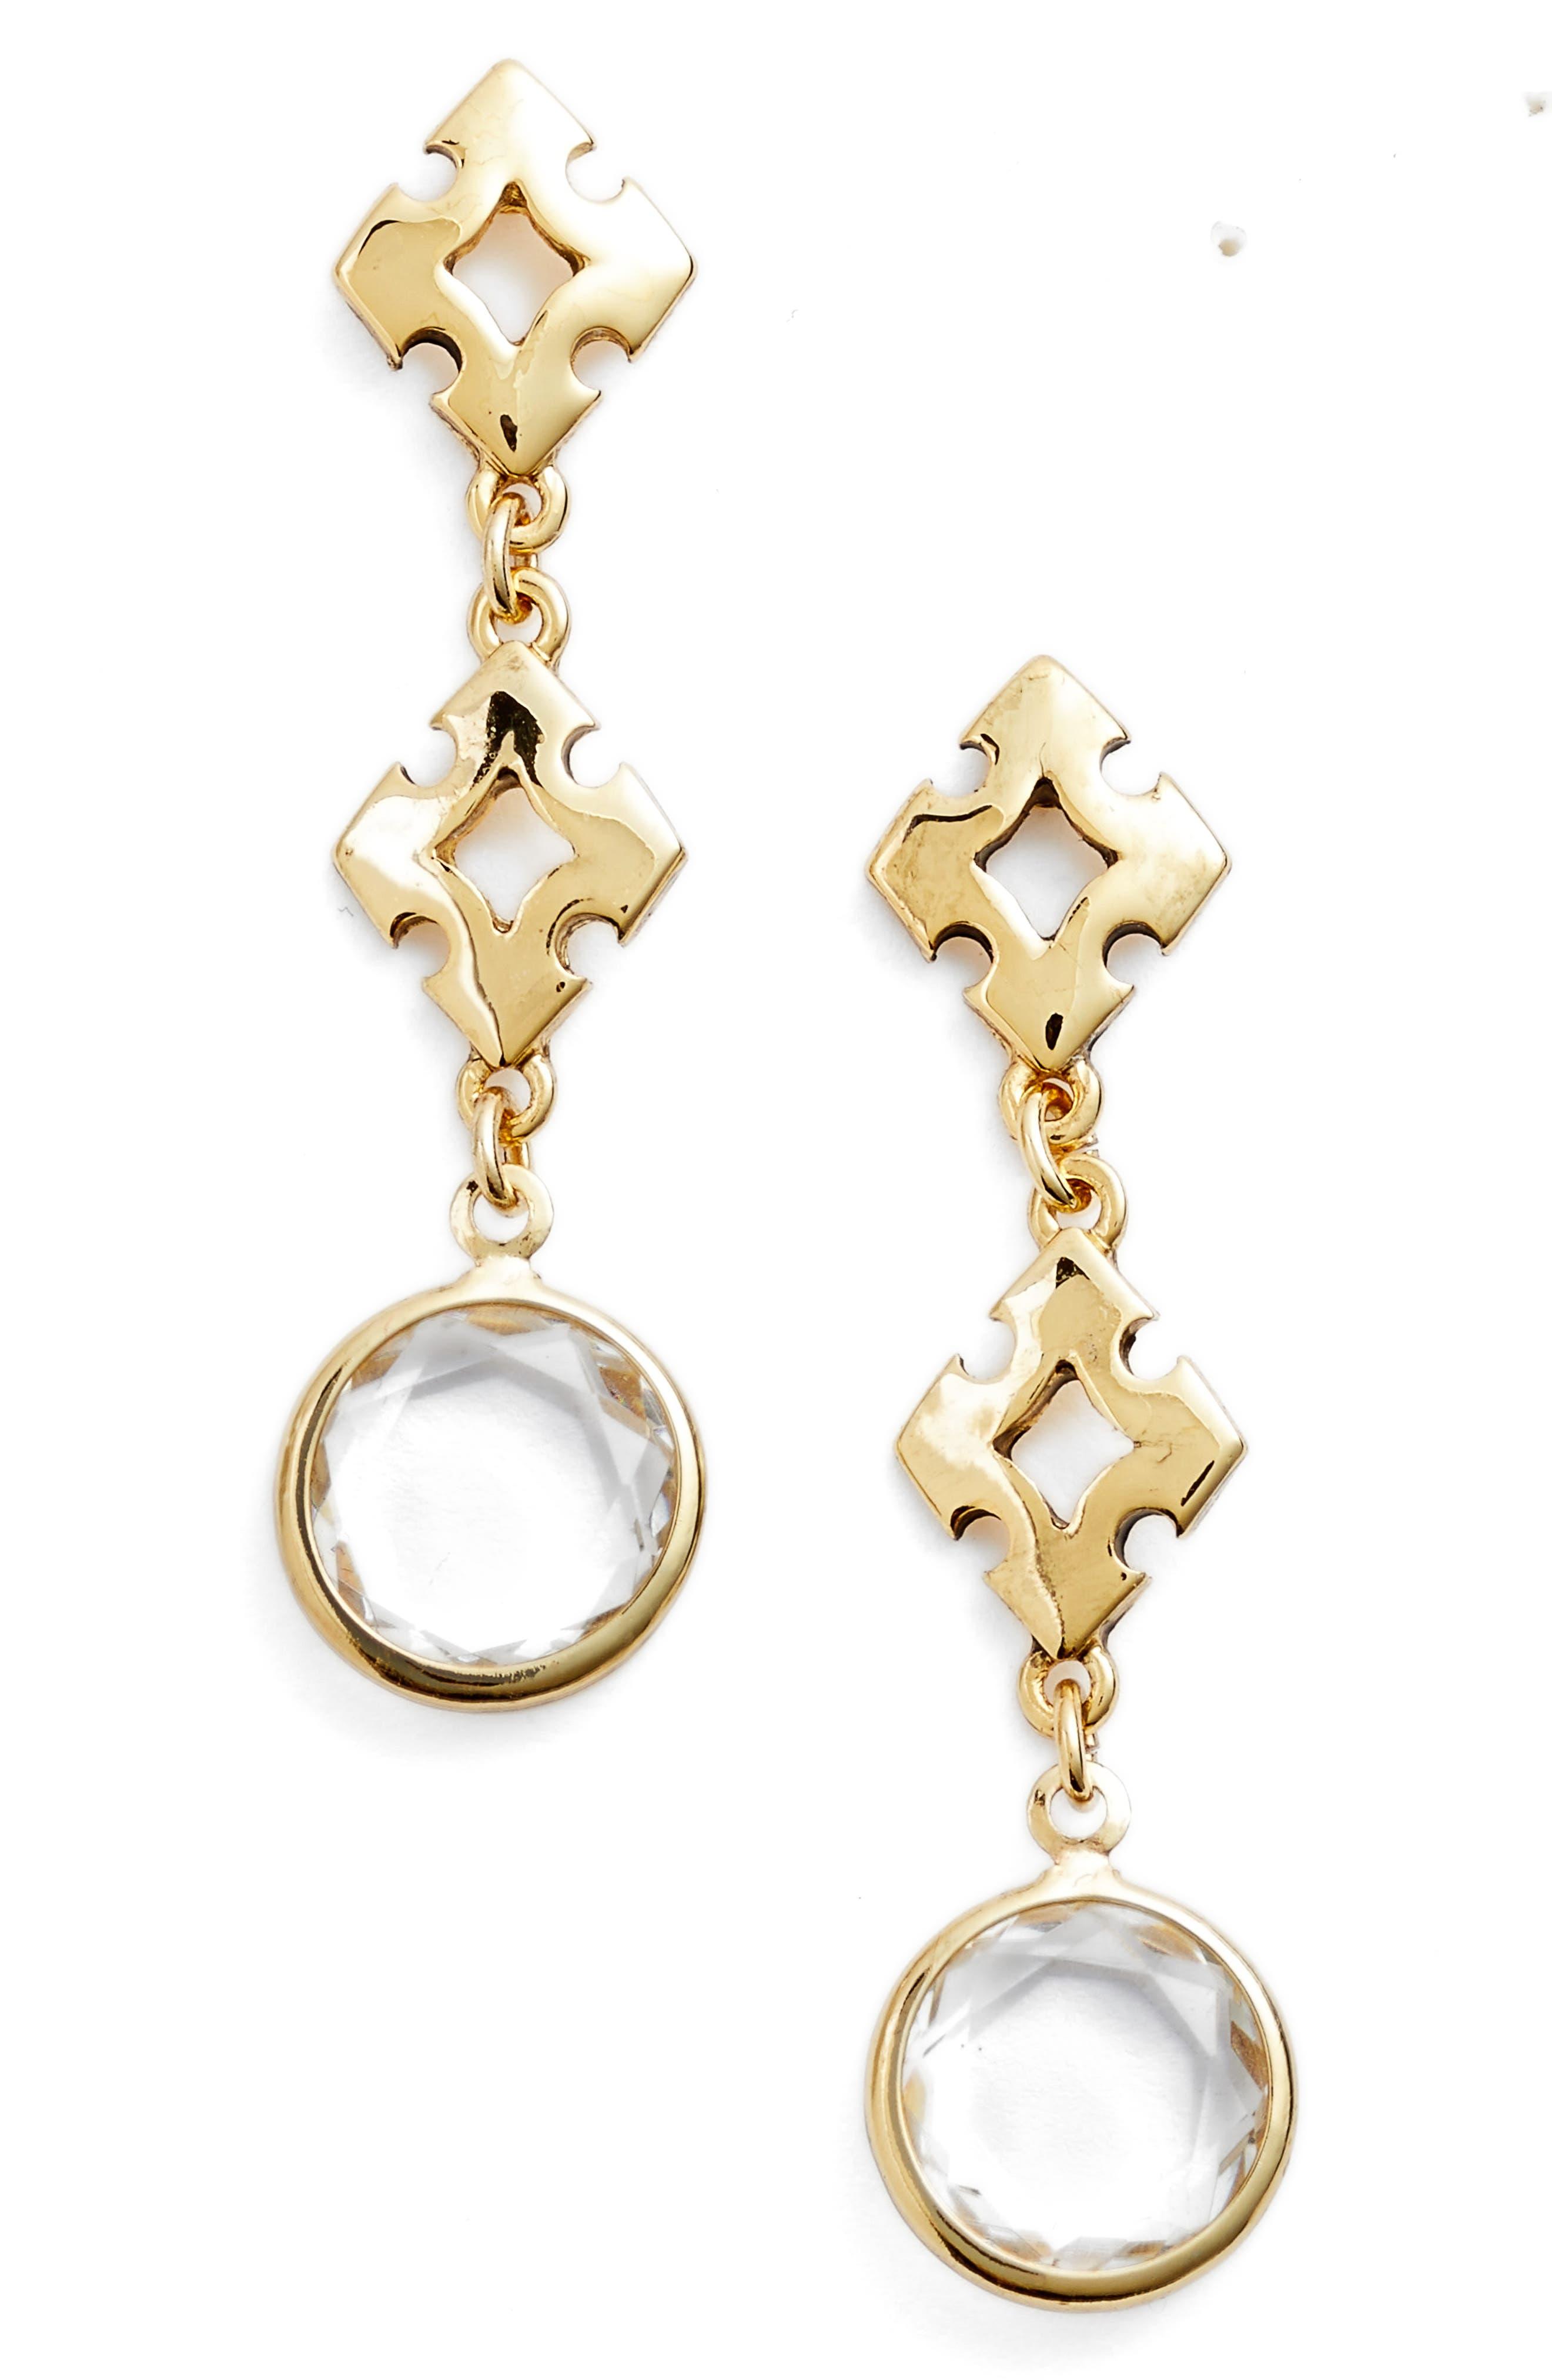 Badgley Mischka Crystal Drop Earrings,                             Main thumbnail 1, color,                             710